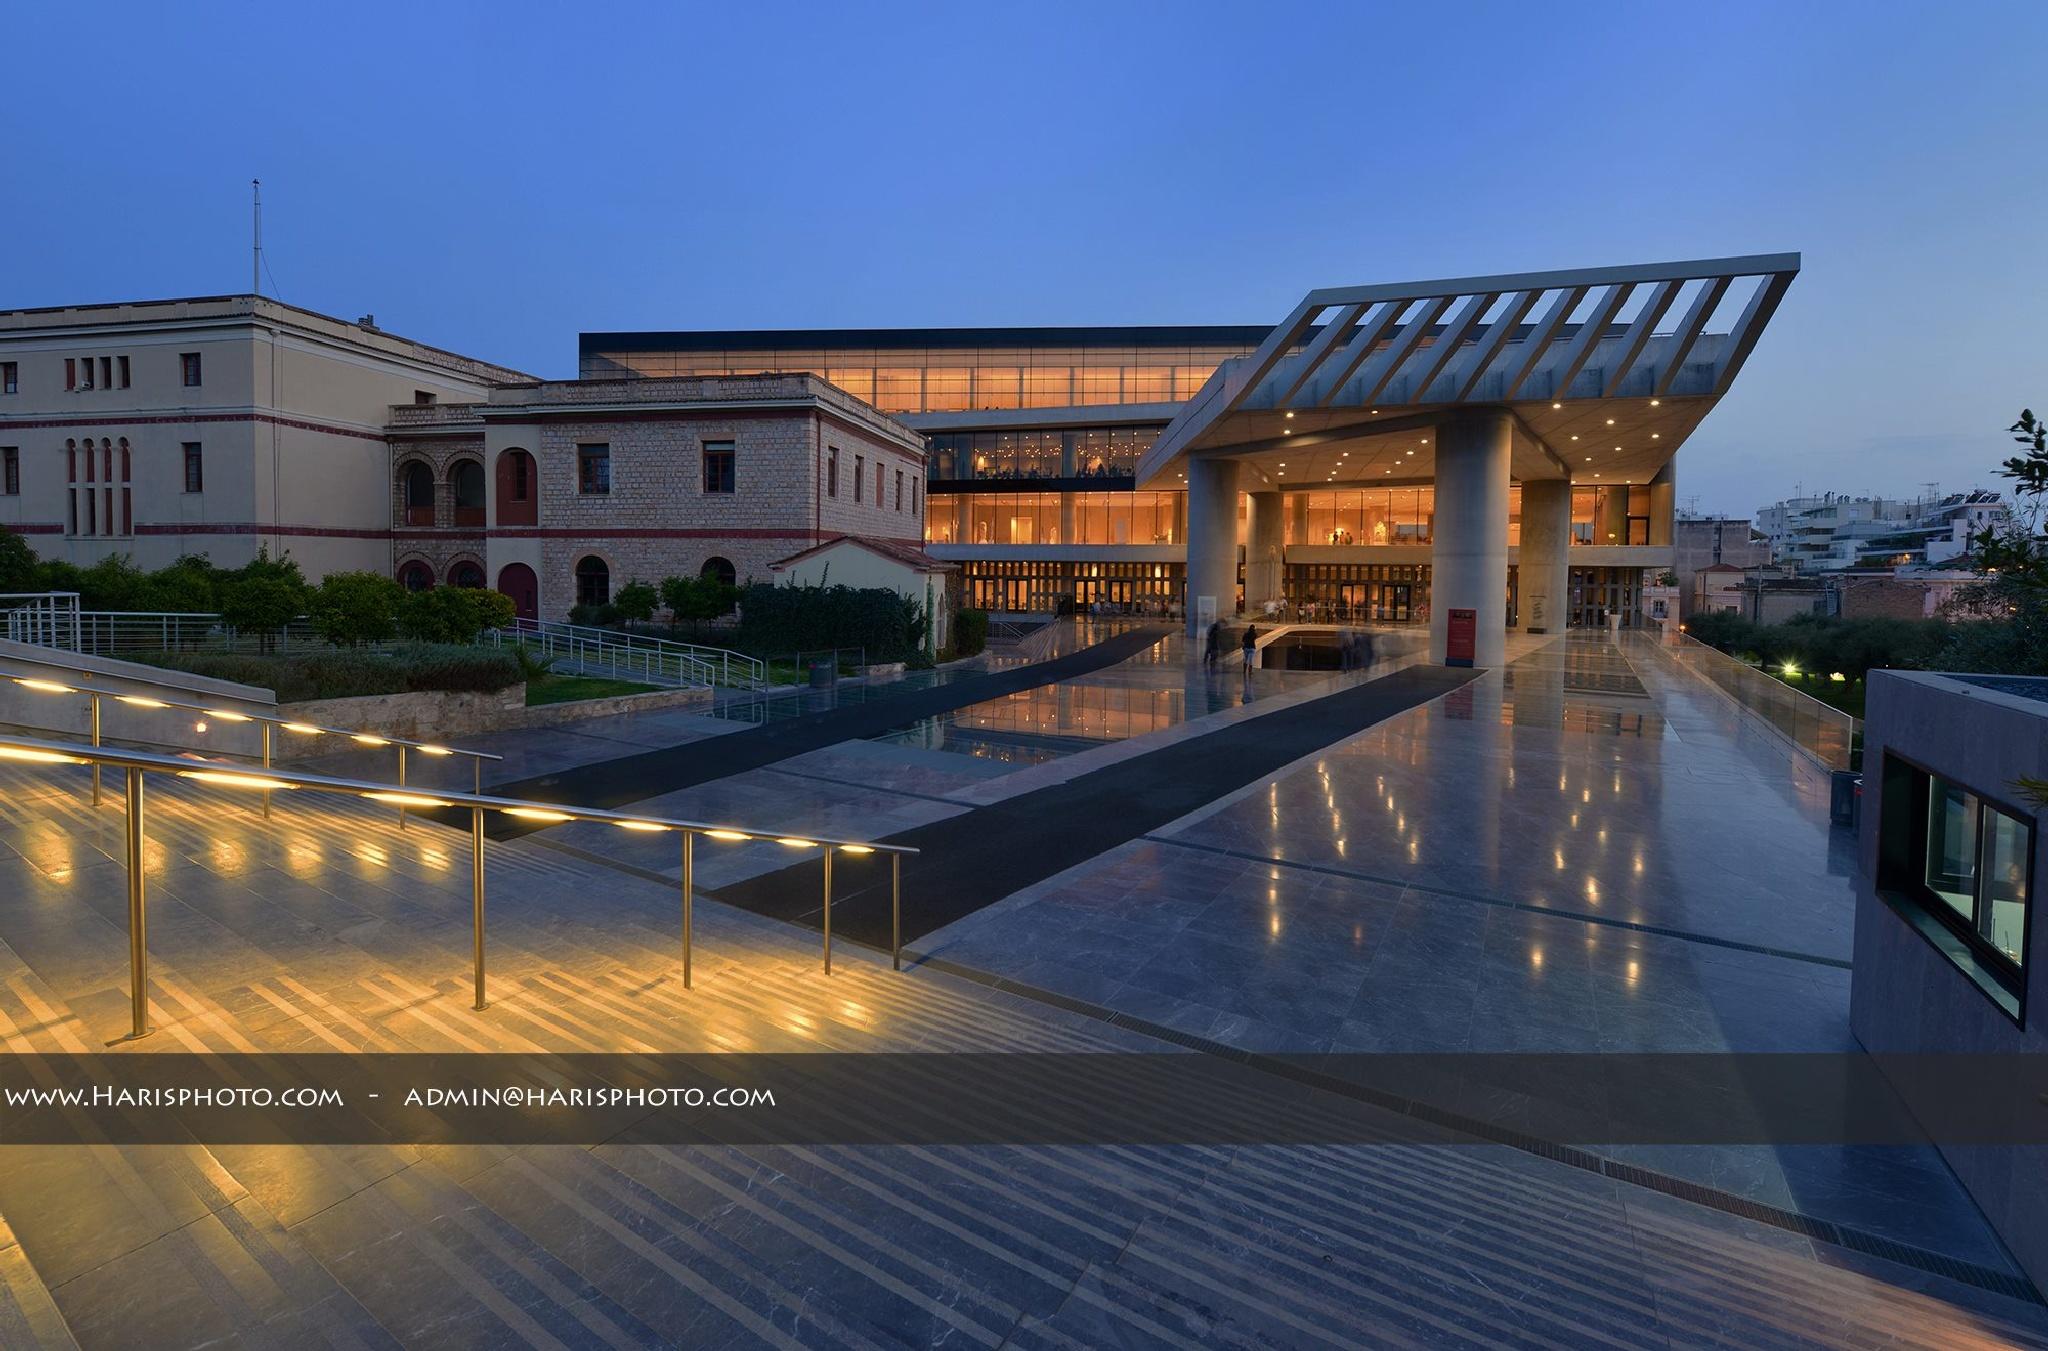 Acropolis Museum by Haris Vithoulkas